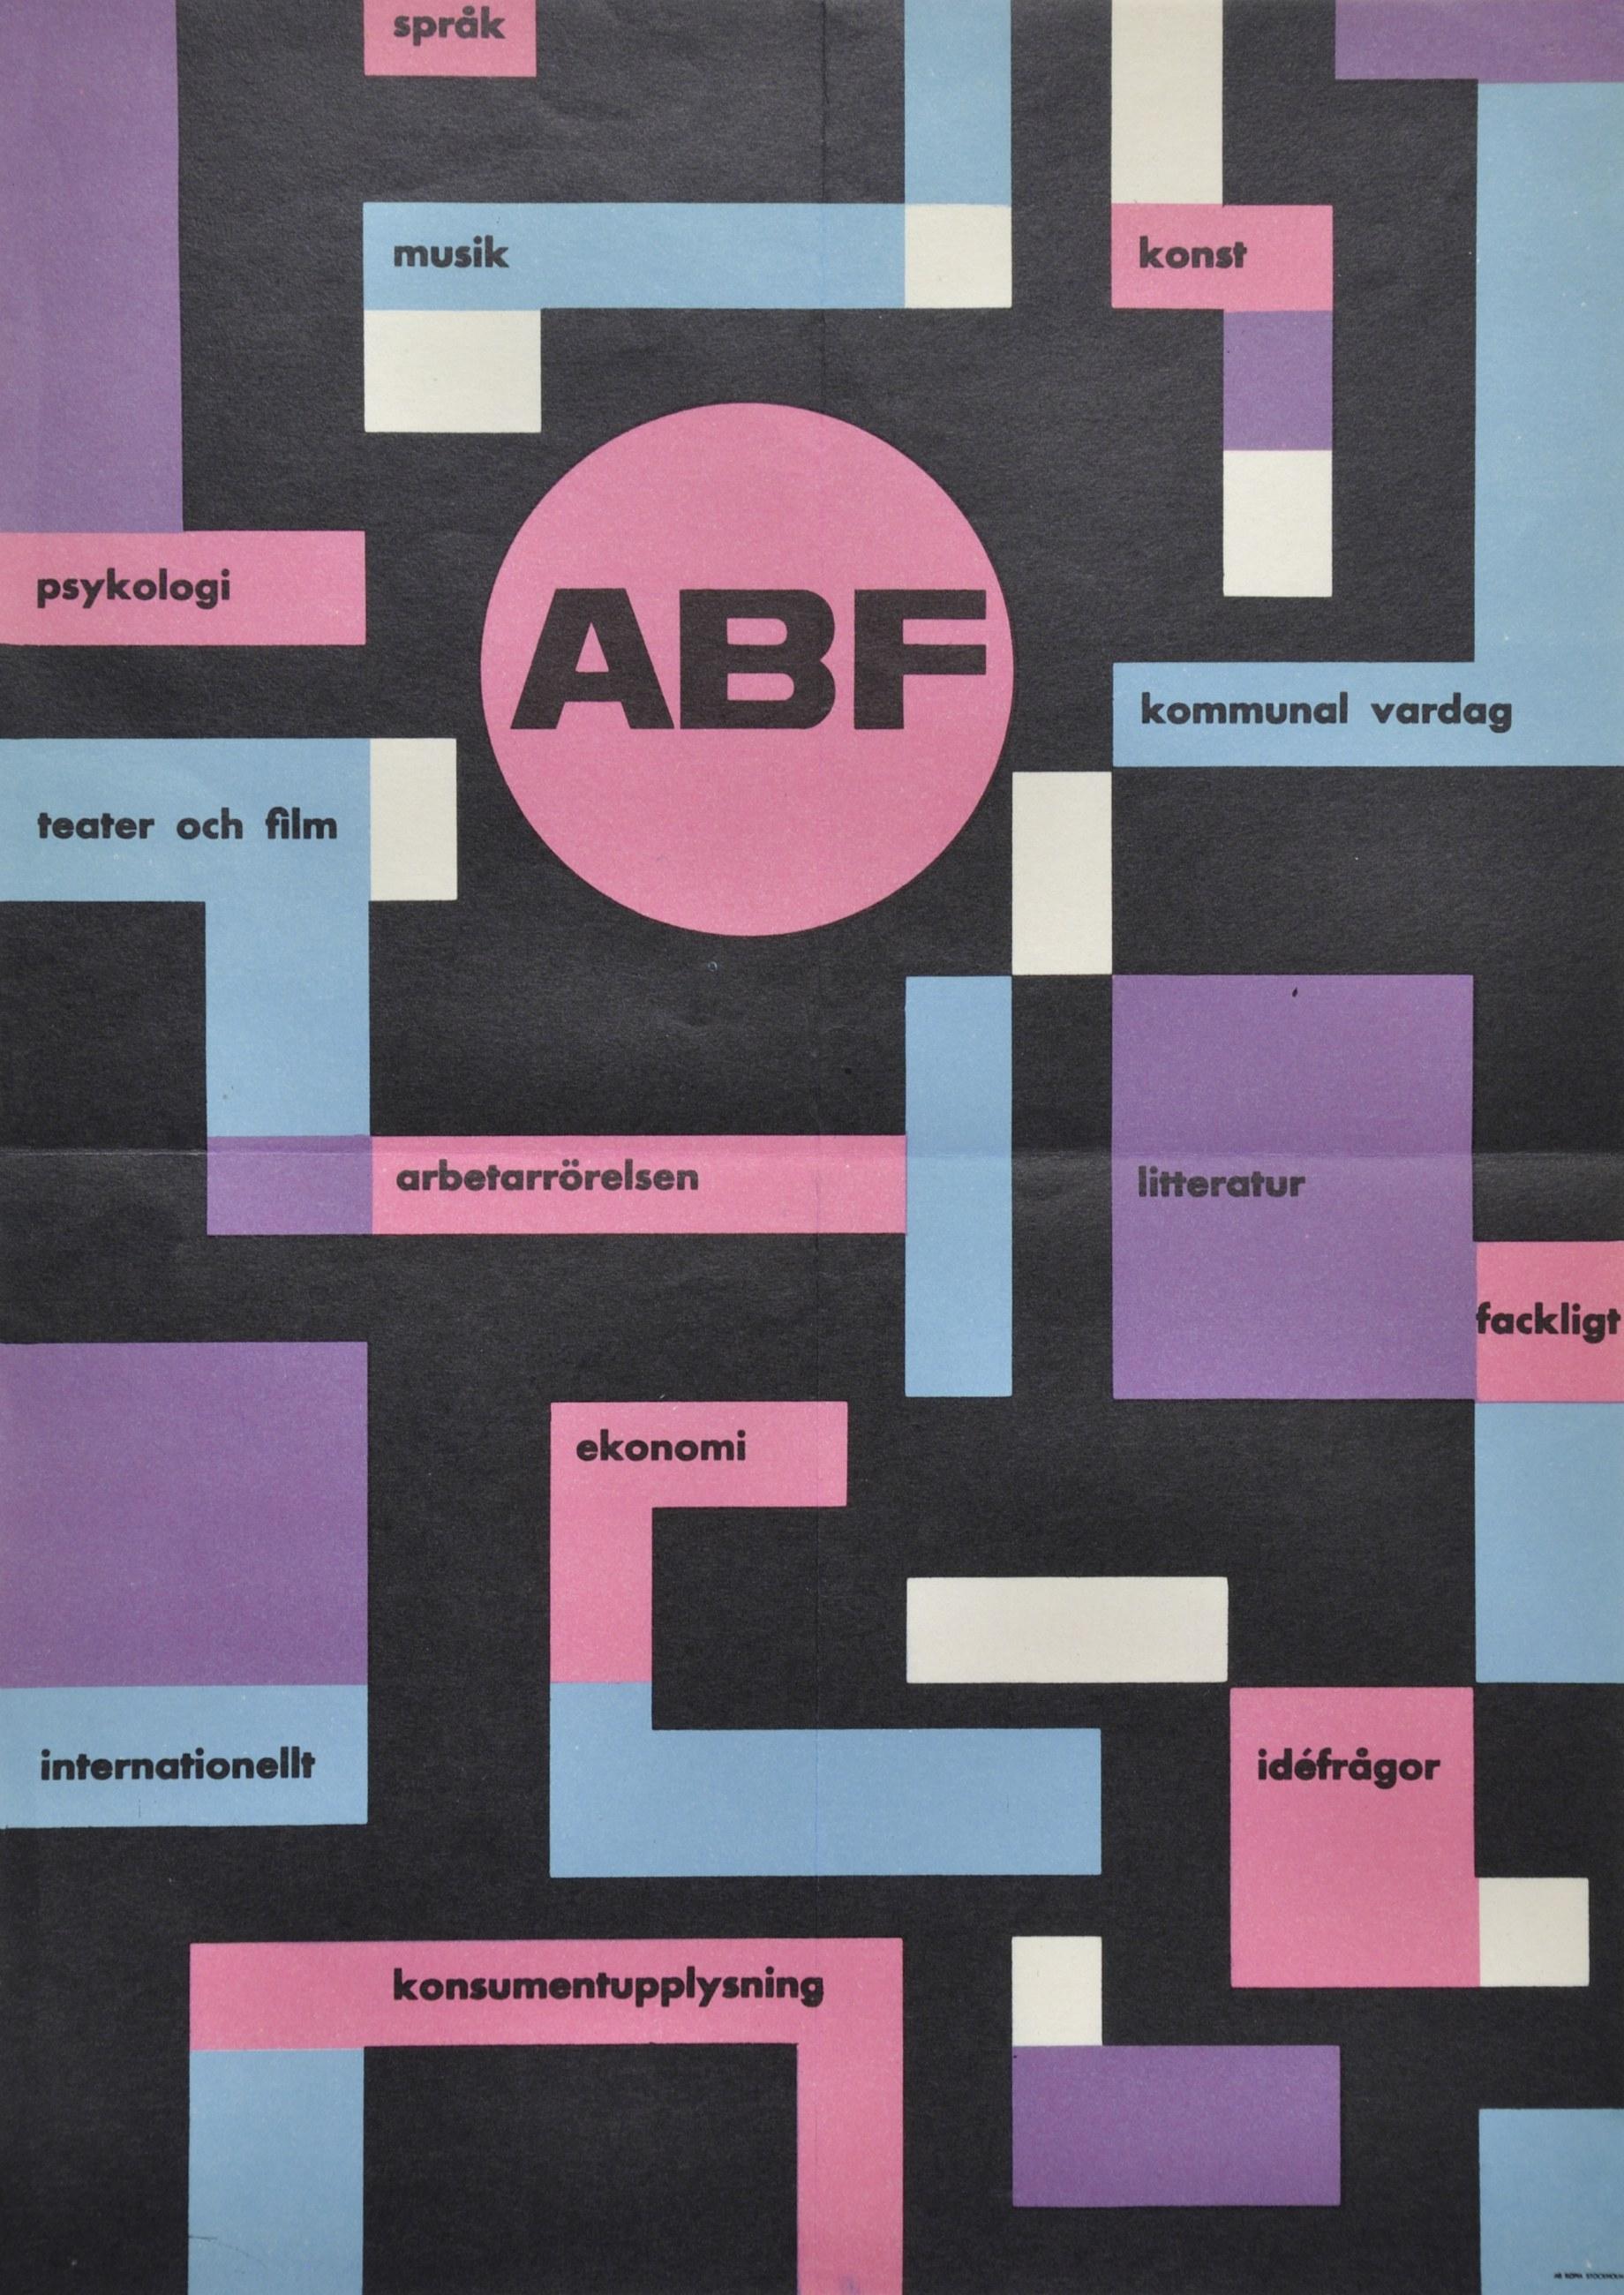 Affisch om ABF